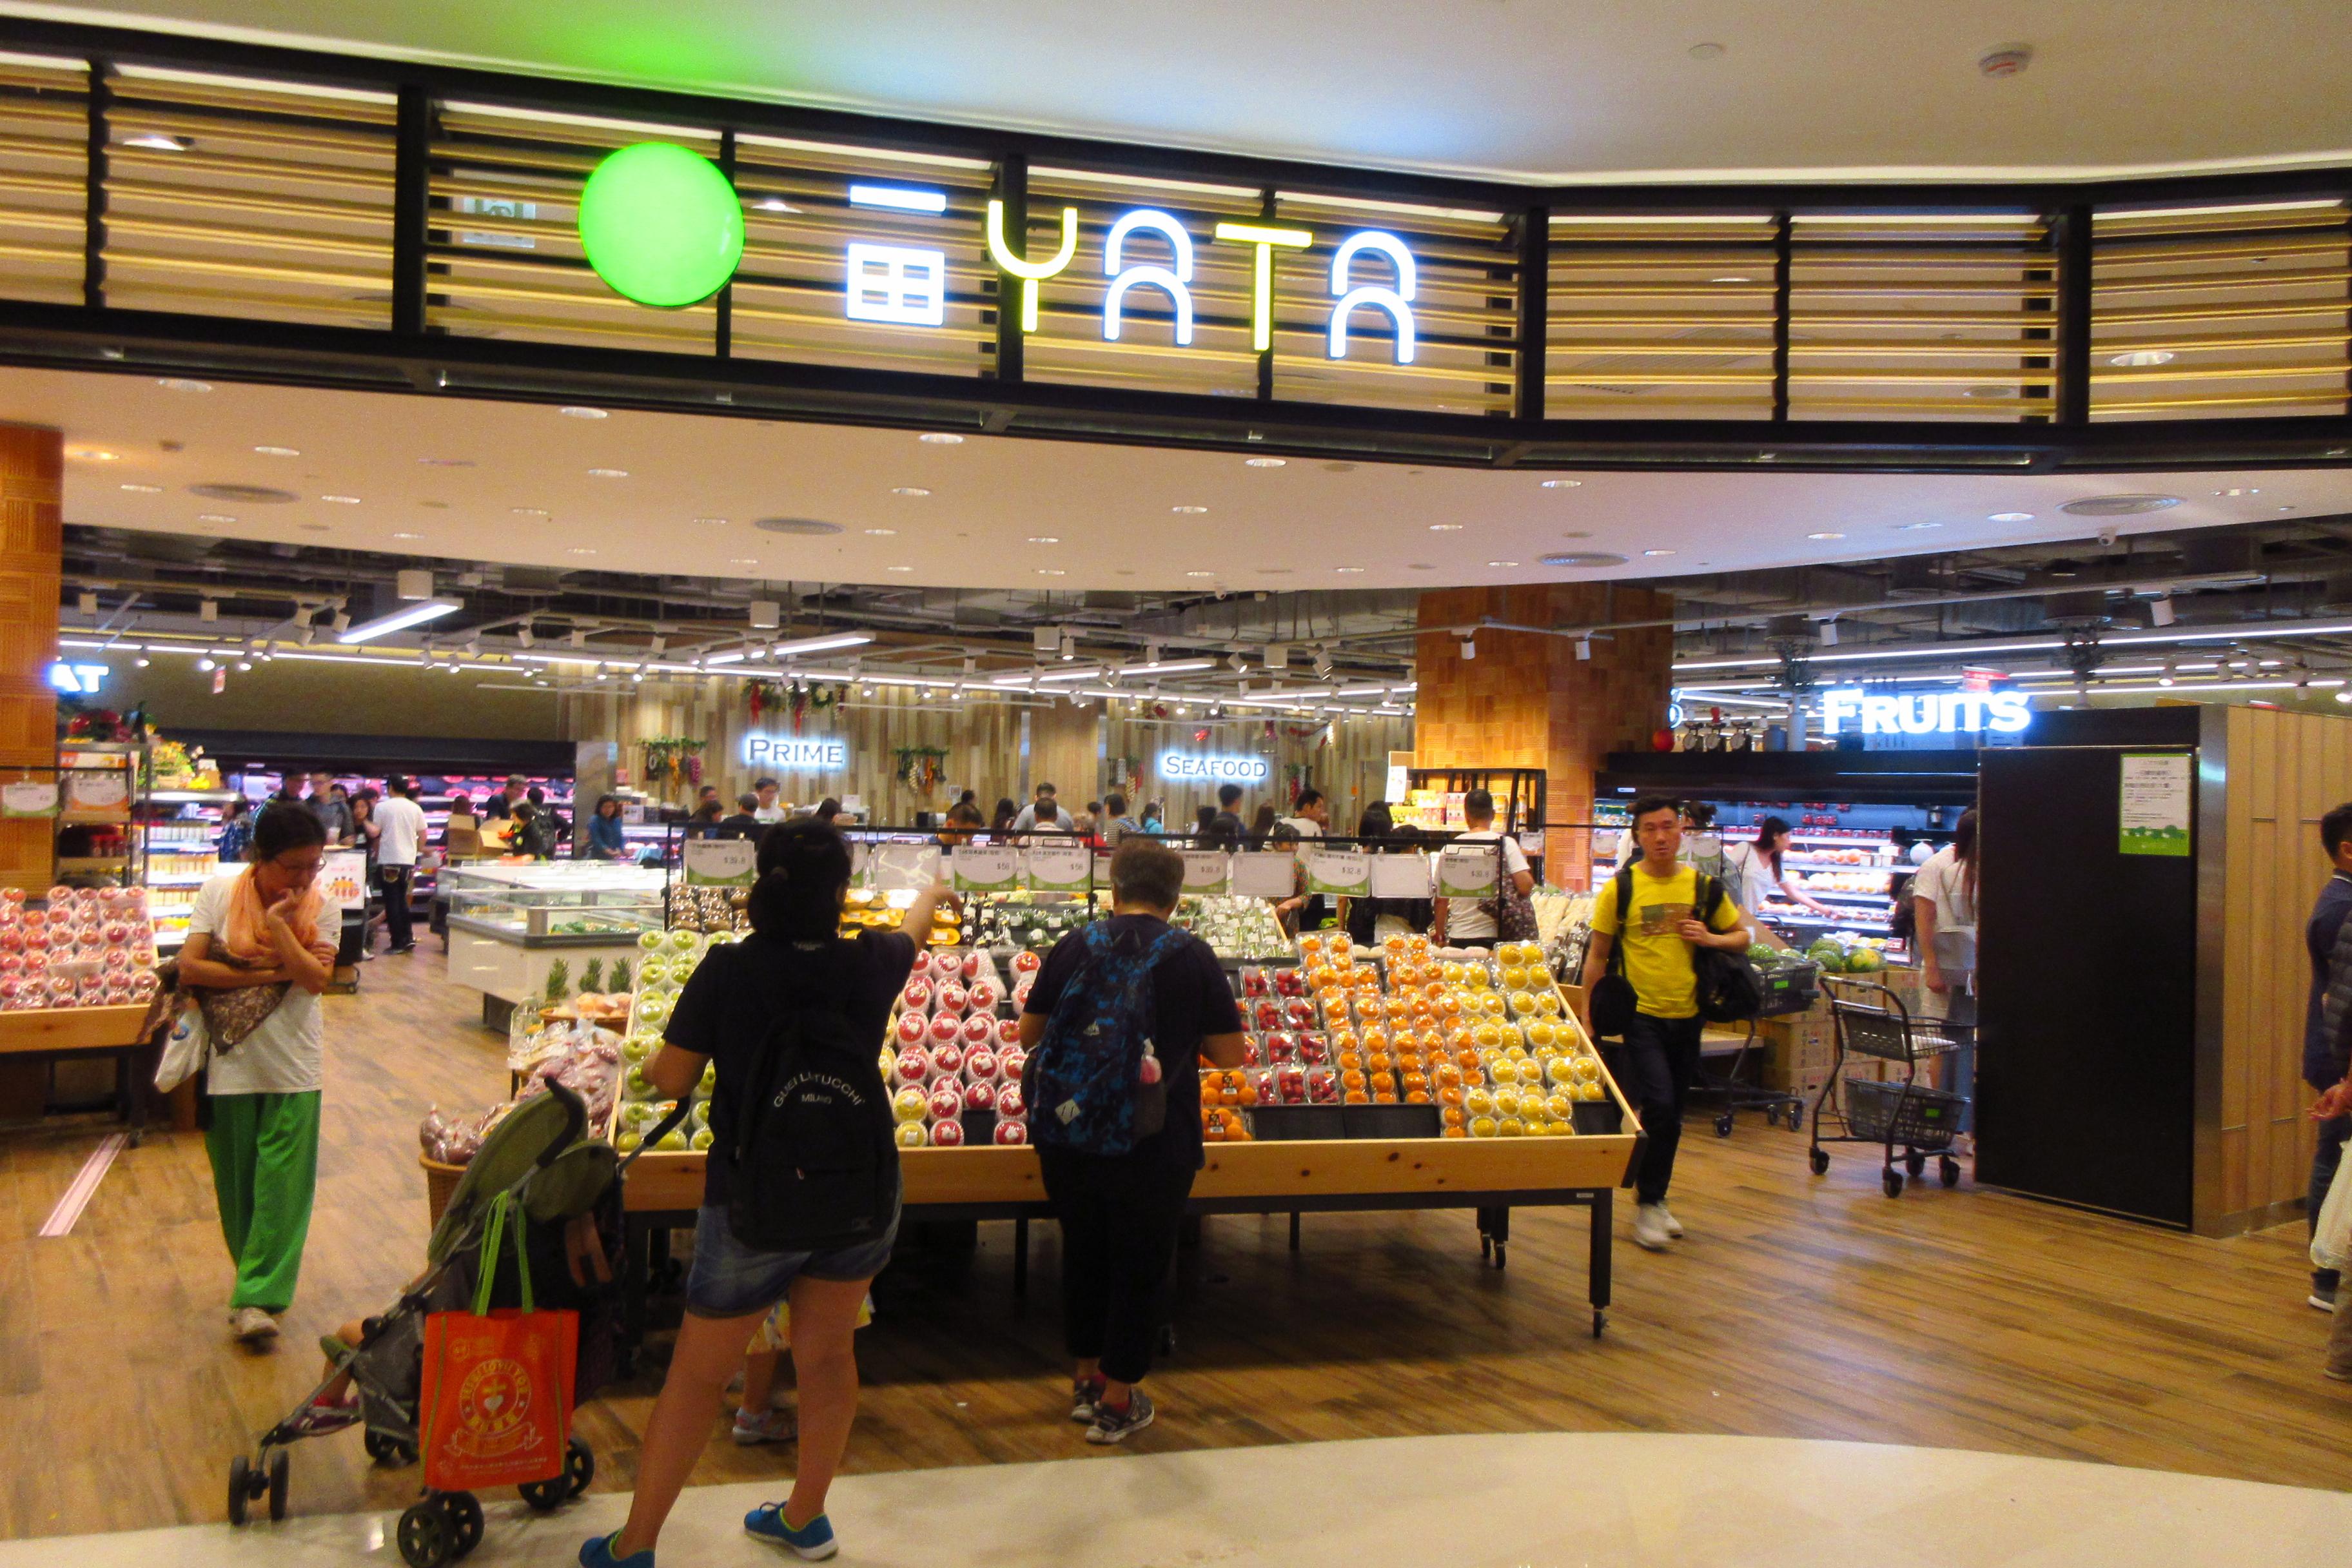 File:HK YL 元朗 Yuen Long 形點 Yoho Mall shop 一田百貨 Yata supermarket April 2018 IX2.jpg - Wikimedia Commons